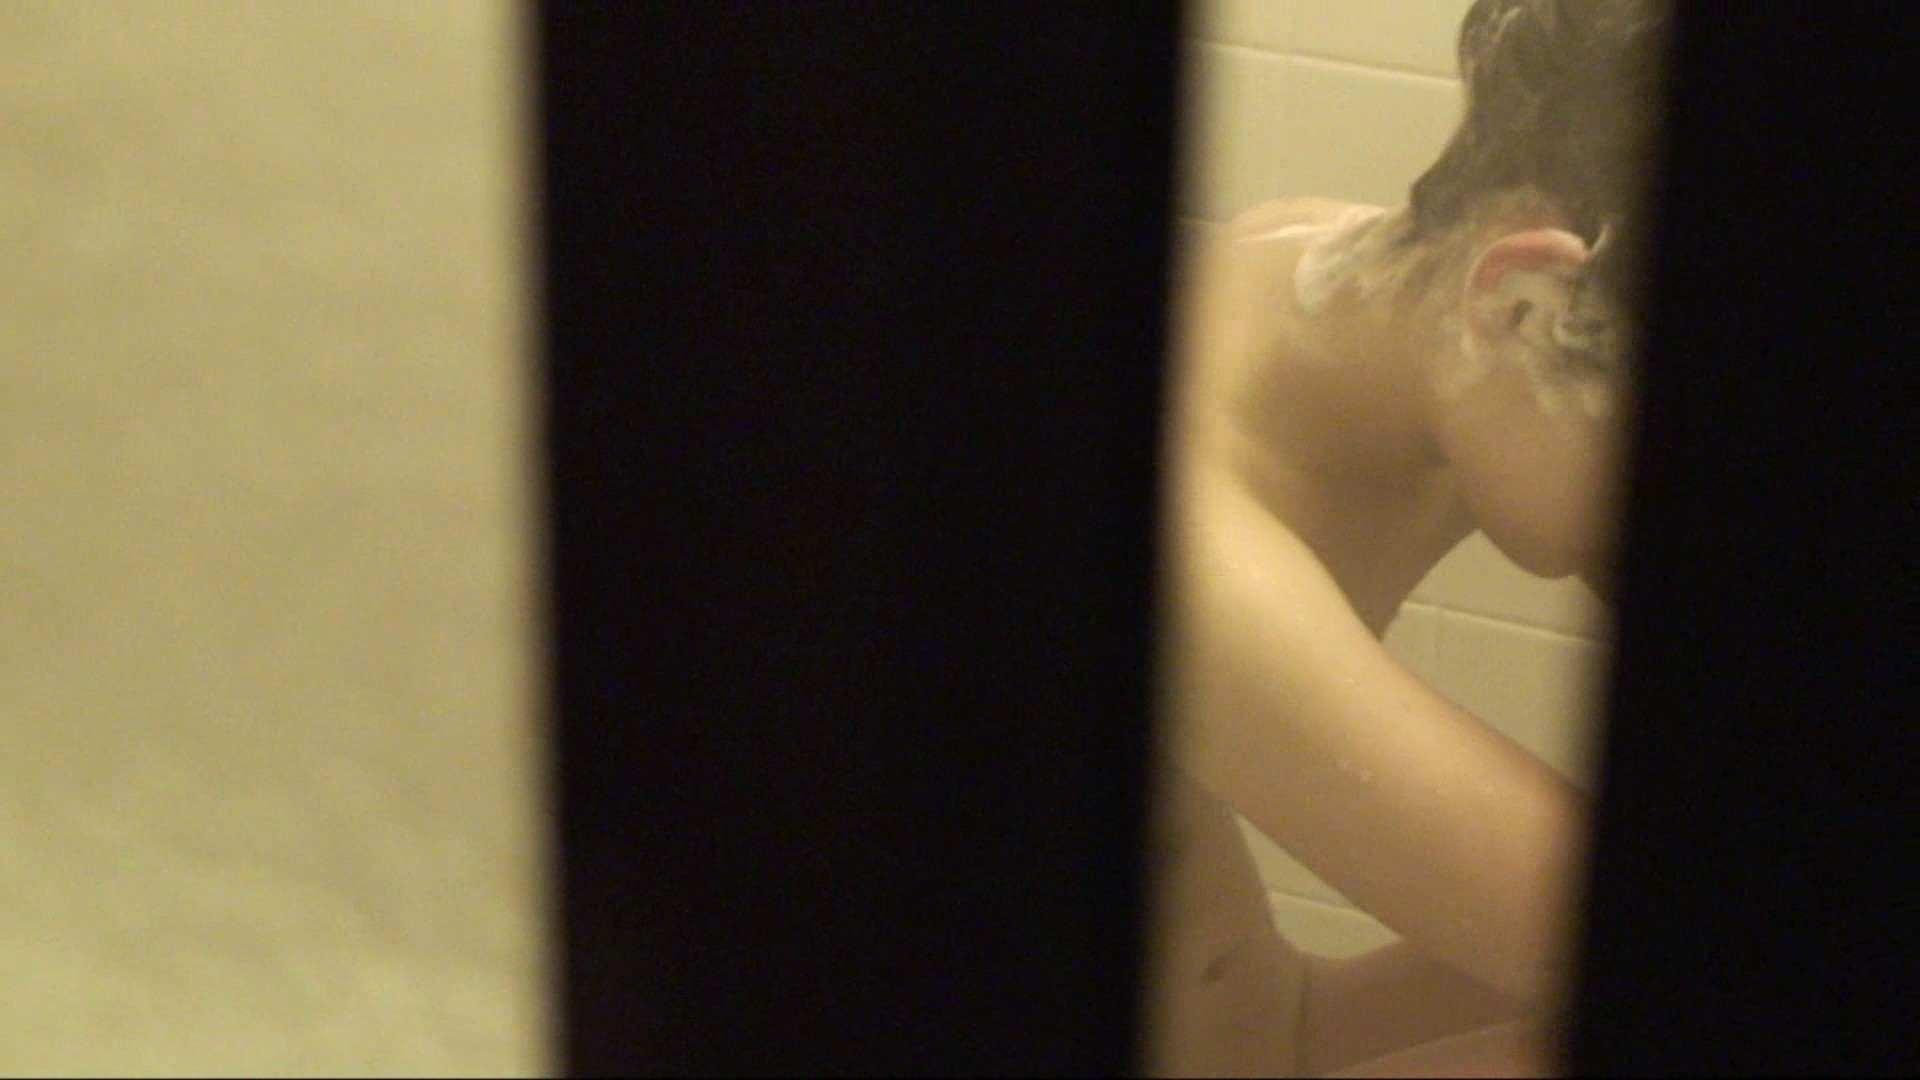 vol.02超可愛すぎる彼女の裸体をハイビジョンで!至近距離での眺め最高! OL女体 ヌード画像 94連発 26